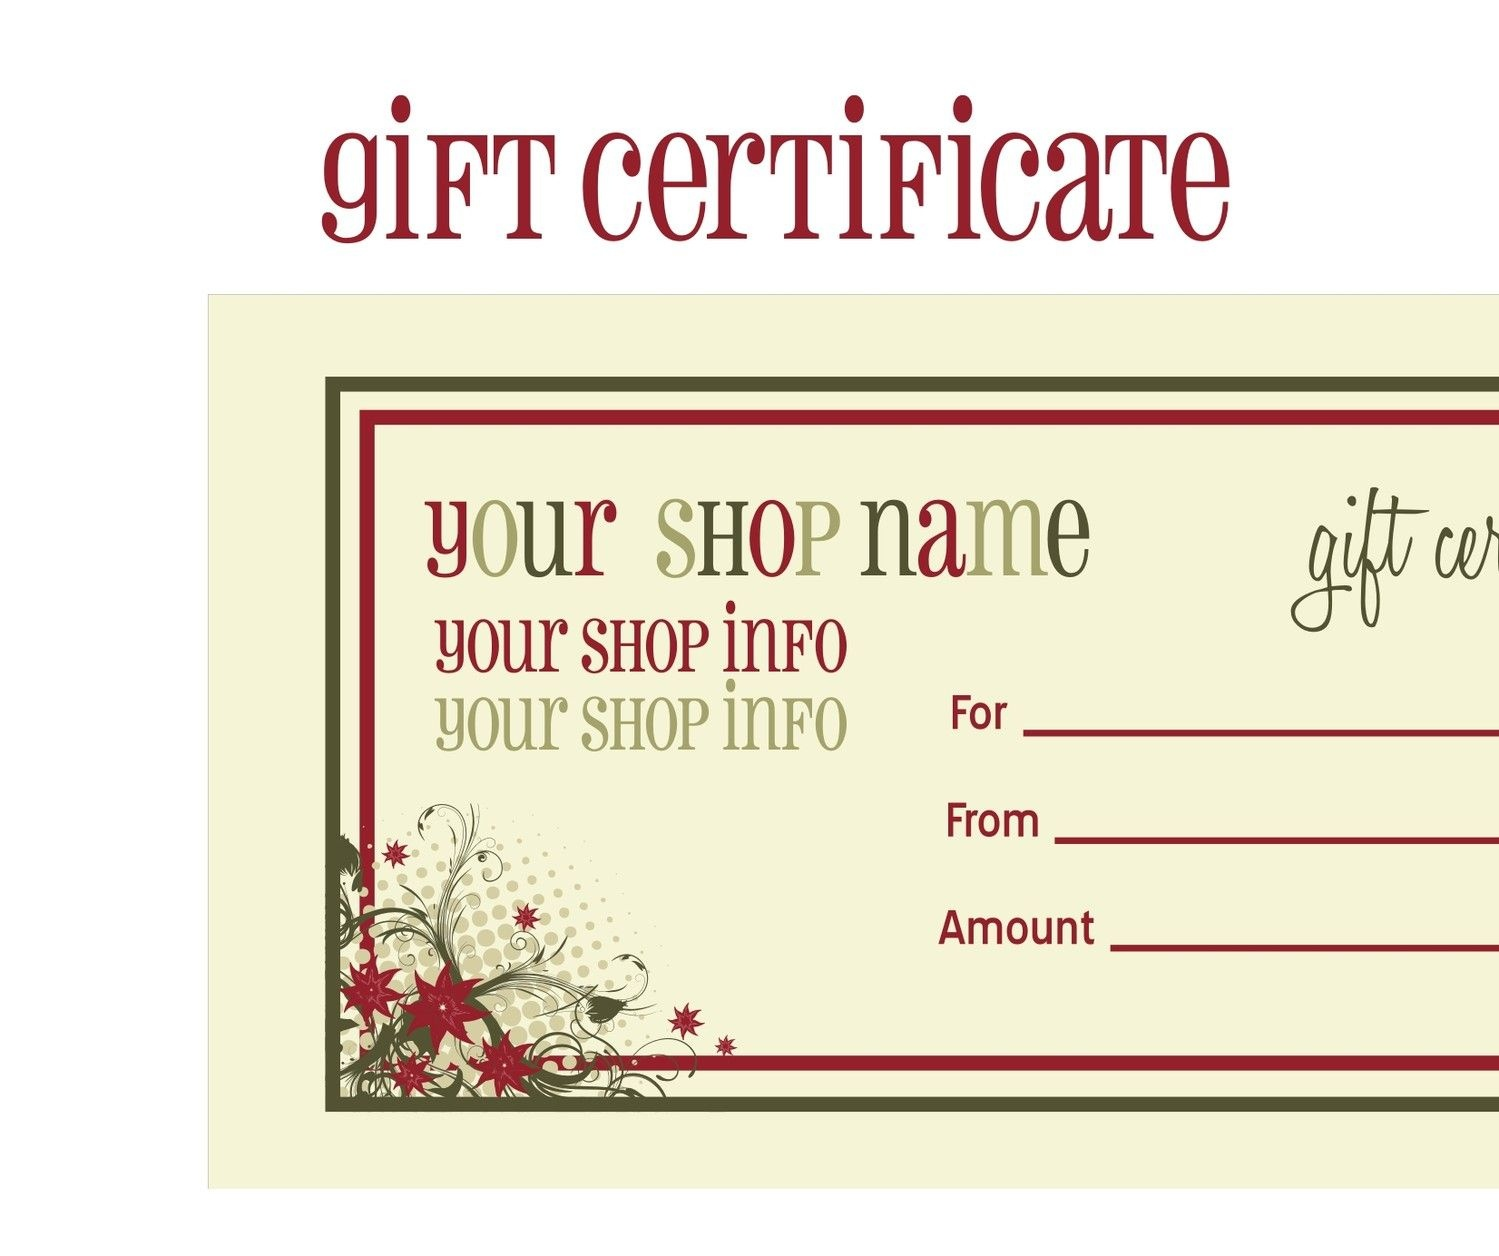 Certificates Printable Calendars Free Printable Avon Gift - Free Printable Gift Certificates For Hair Salon